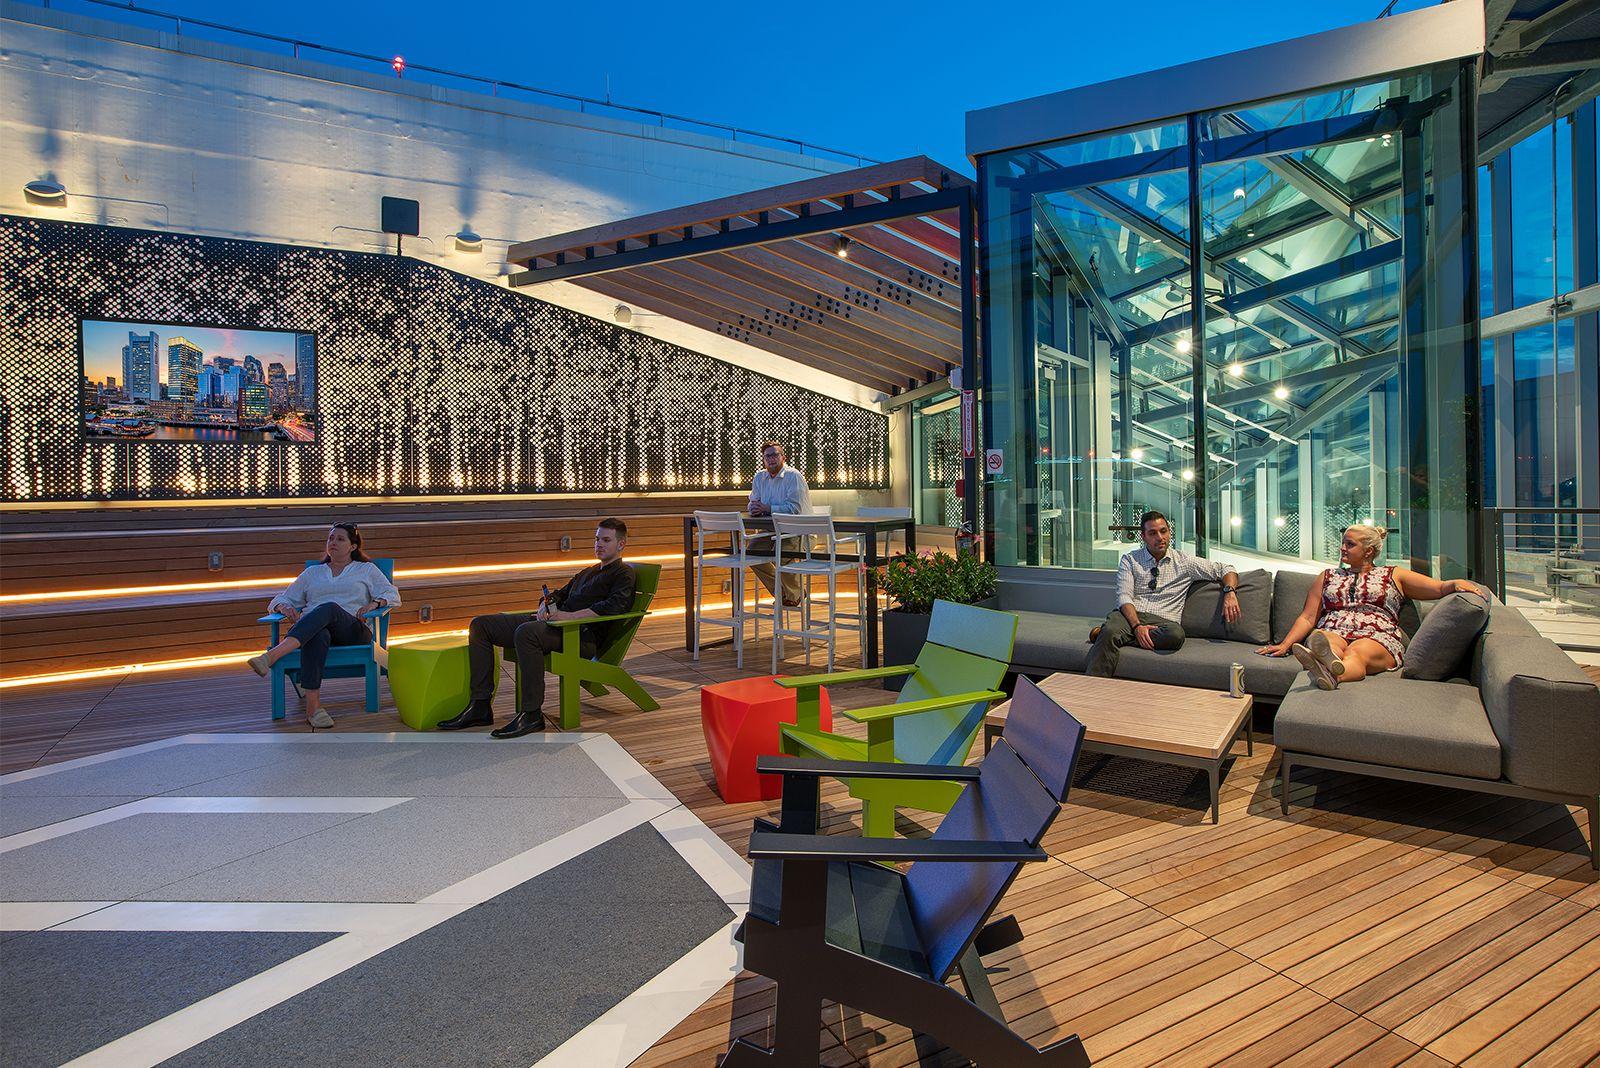 Ptc Roof Deck In 2020 Workplace Design Design Outdoor Decor